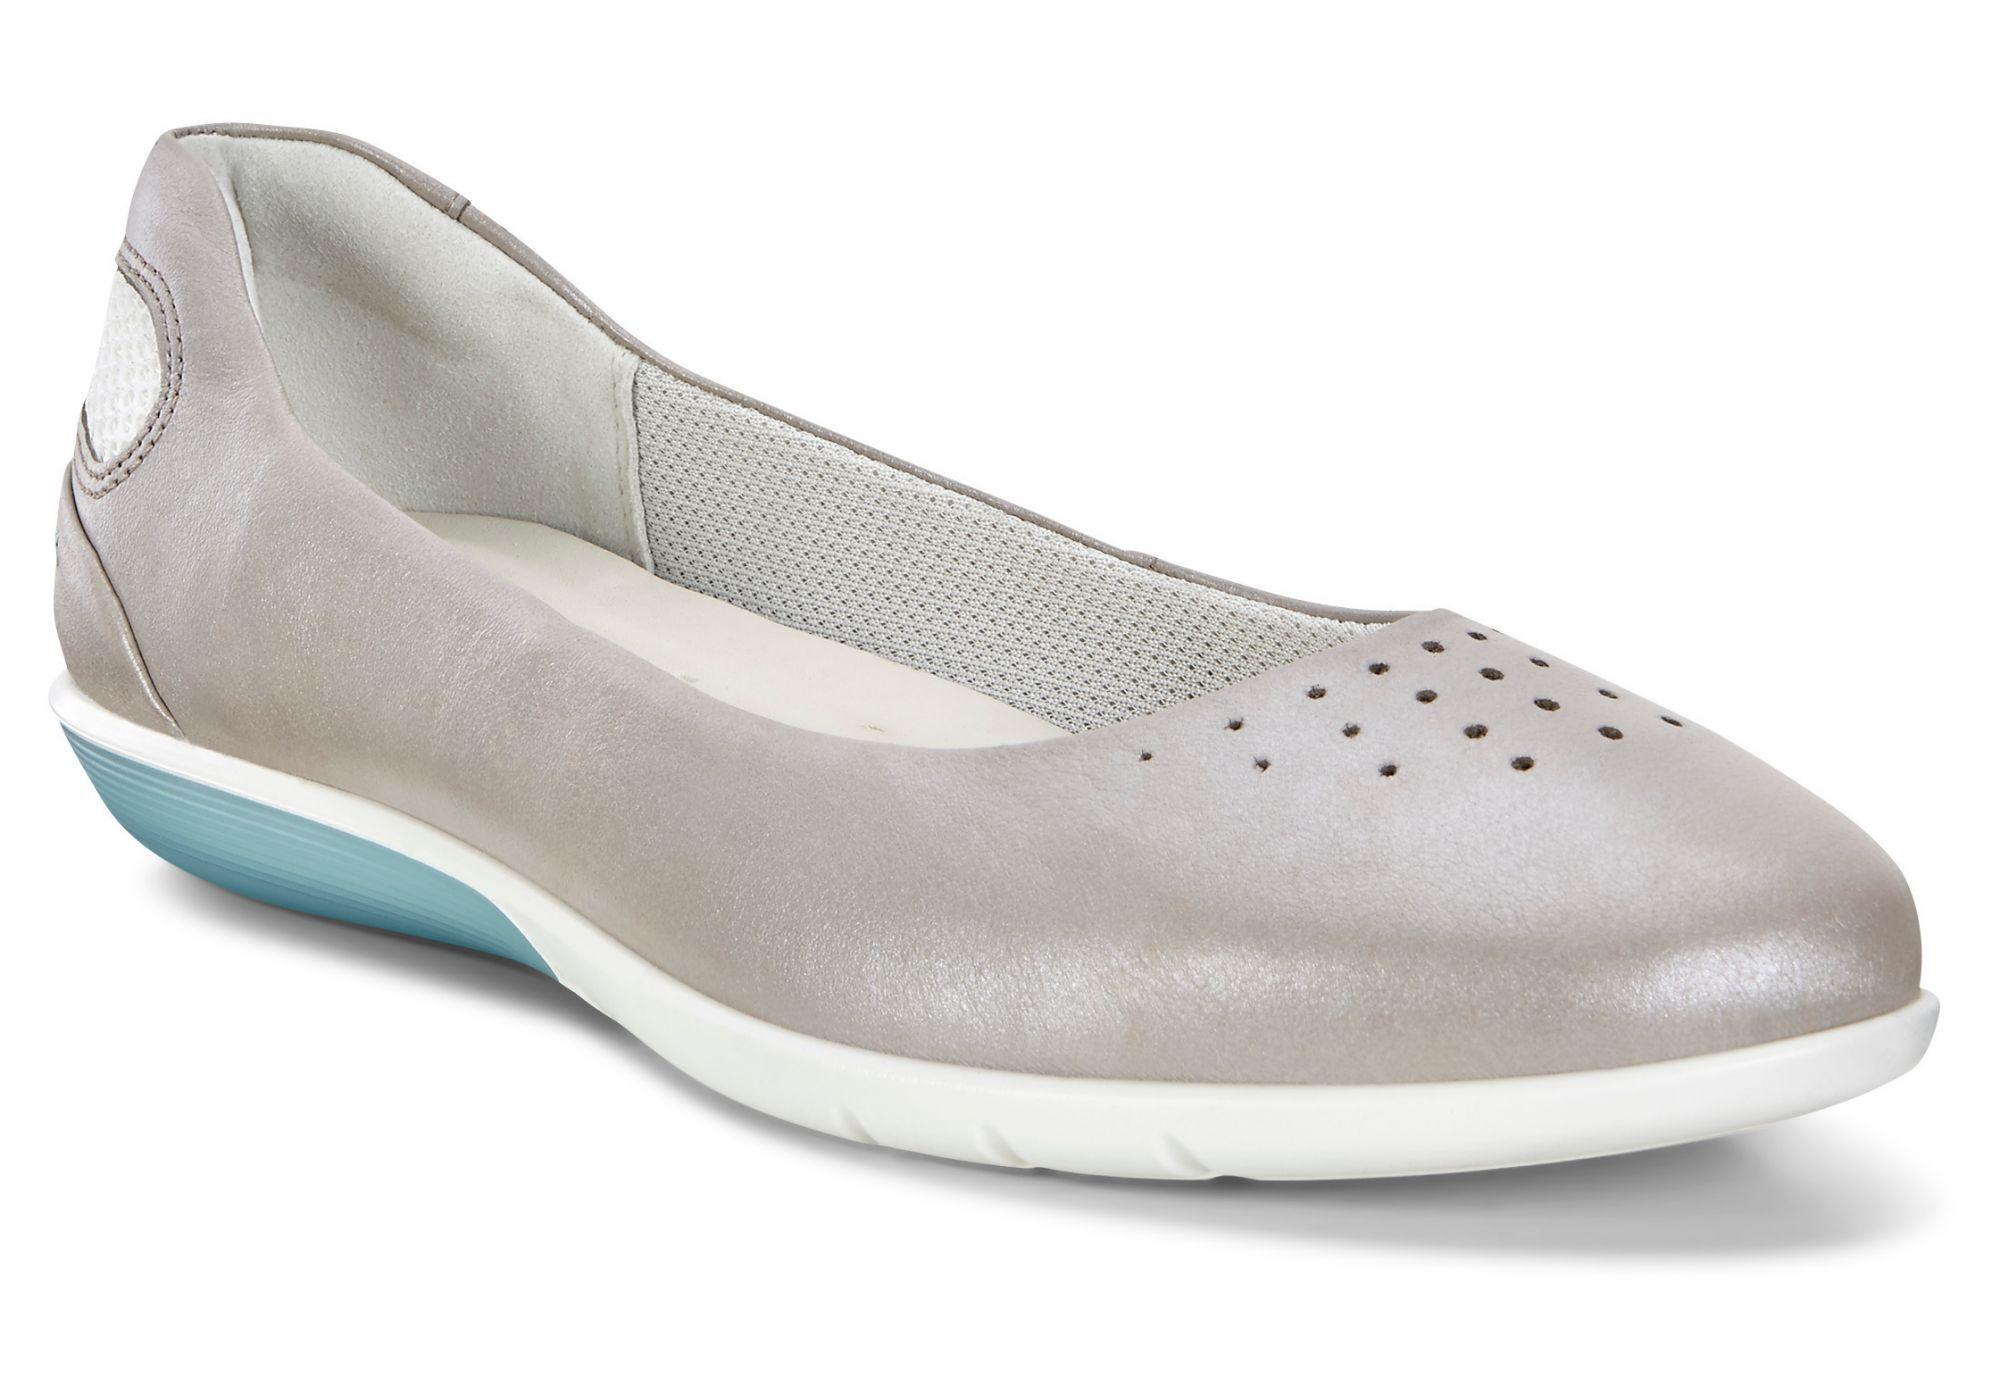 d76e842b6f9e3b ECCO Sense Light 28453350555 Moon Rock- Silver White - Ladies Athleisure  Shoes